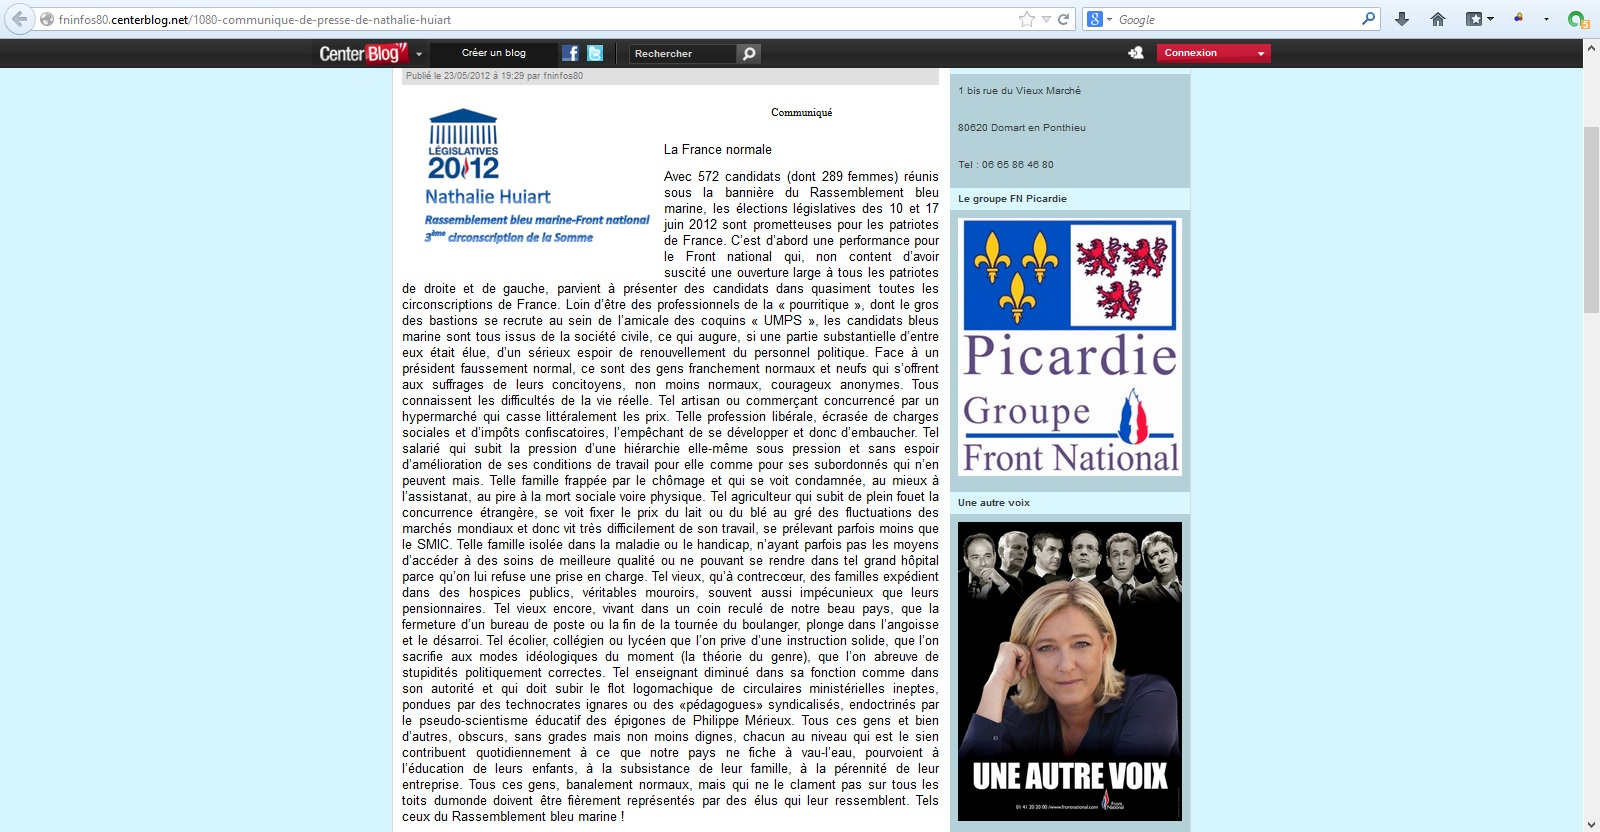 FN_Theorie_du_genre-Somme